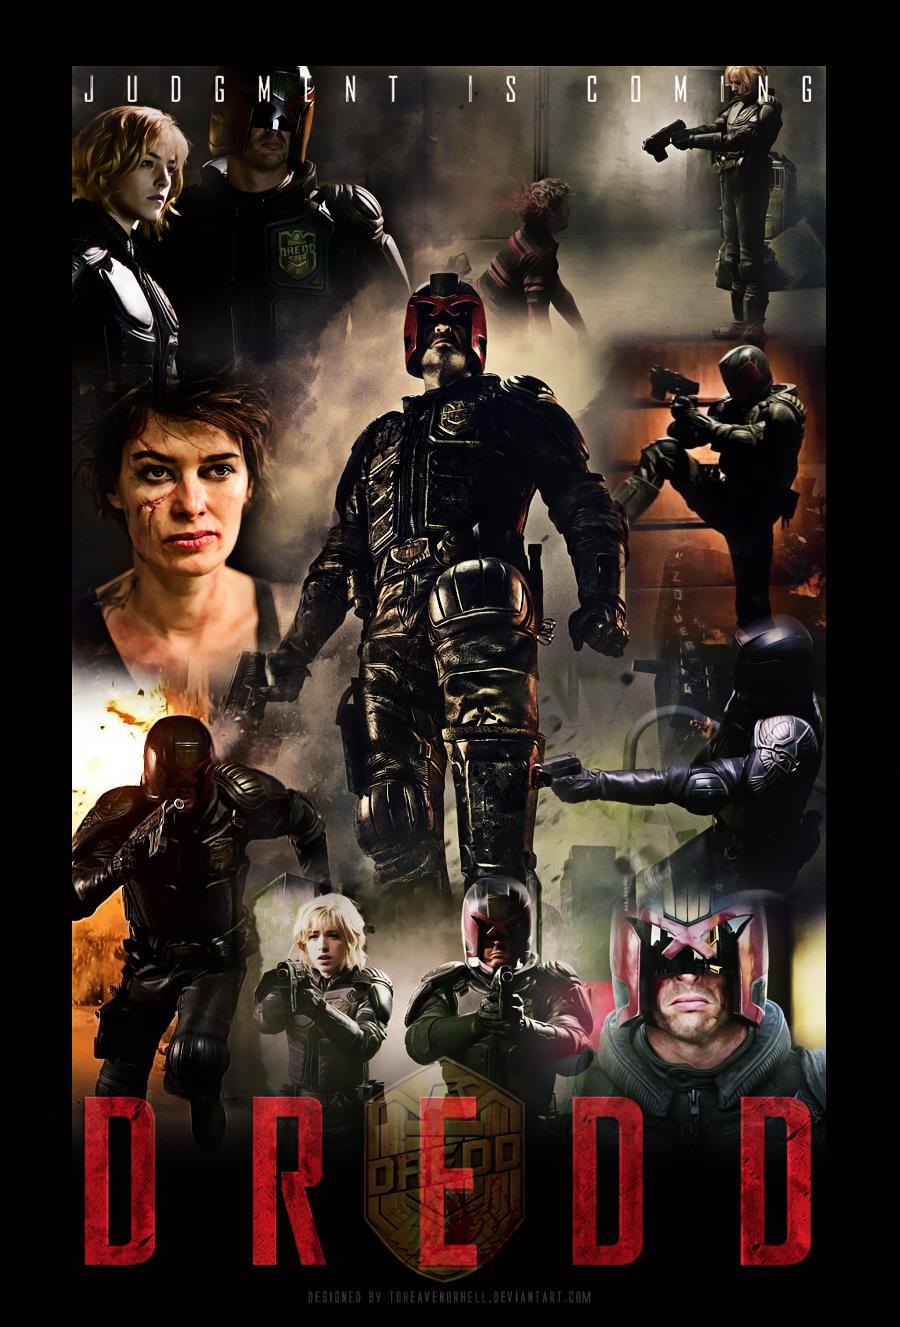 Dredd Movie Poster by ToHeavenOrHell on DeviantArt